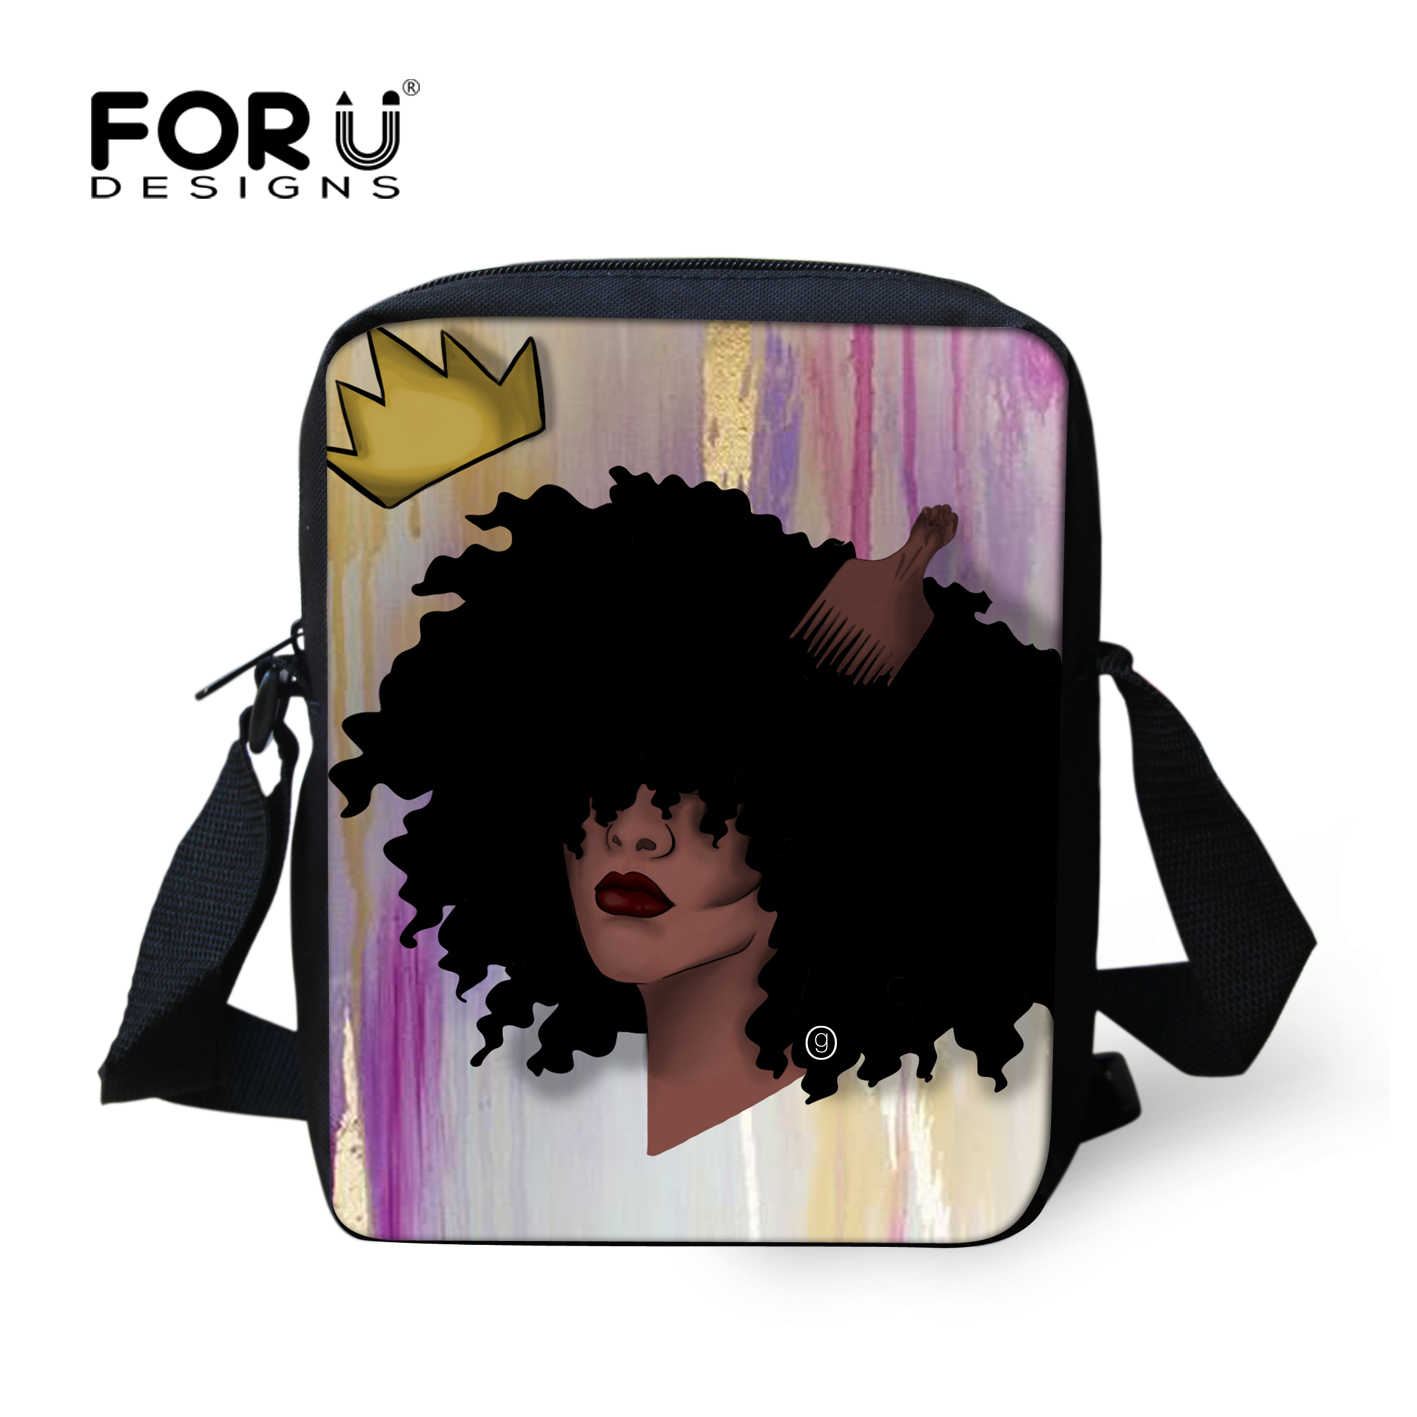 Forudesigns Crossbody School Bags Ager S Shoulder Bag African Princess Art Messenger Women Tote Children Satchel New